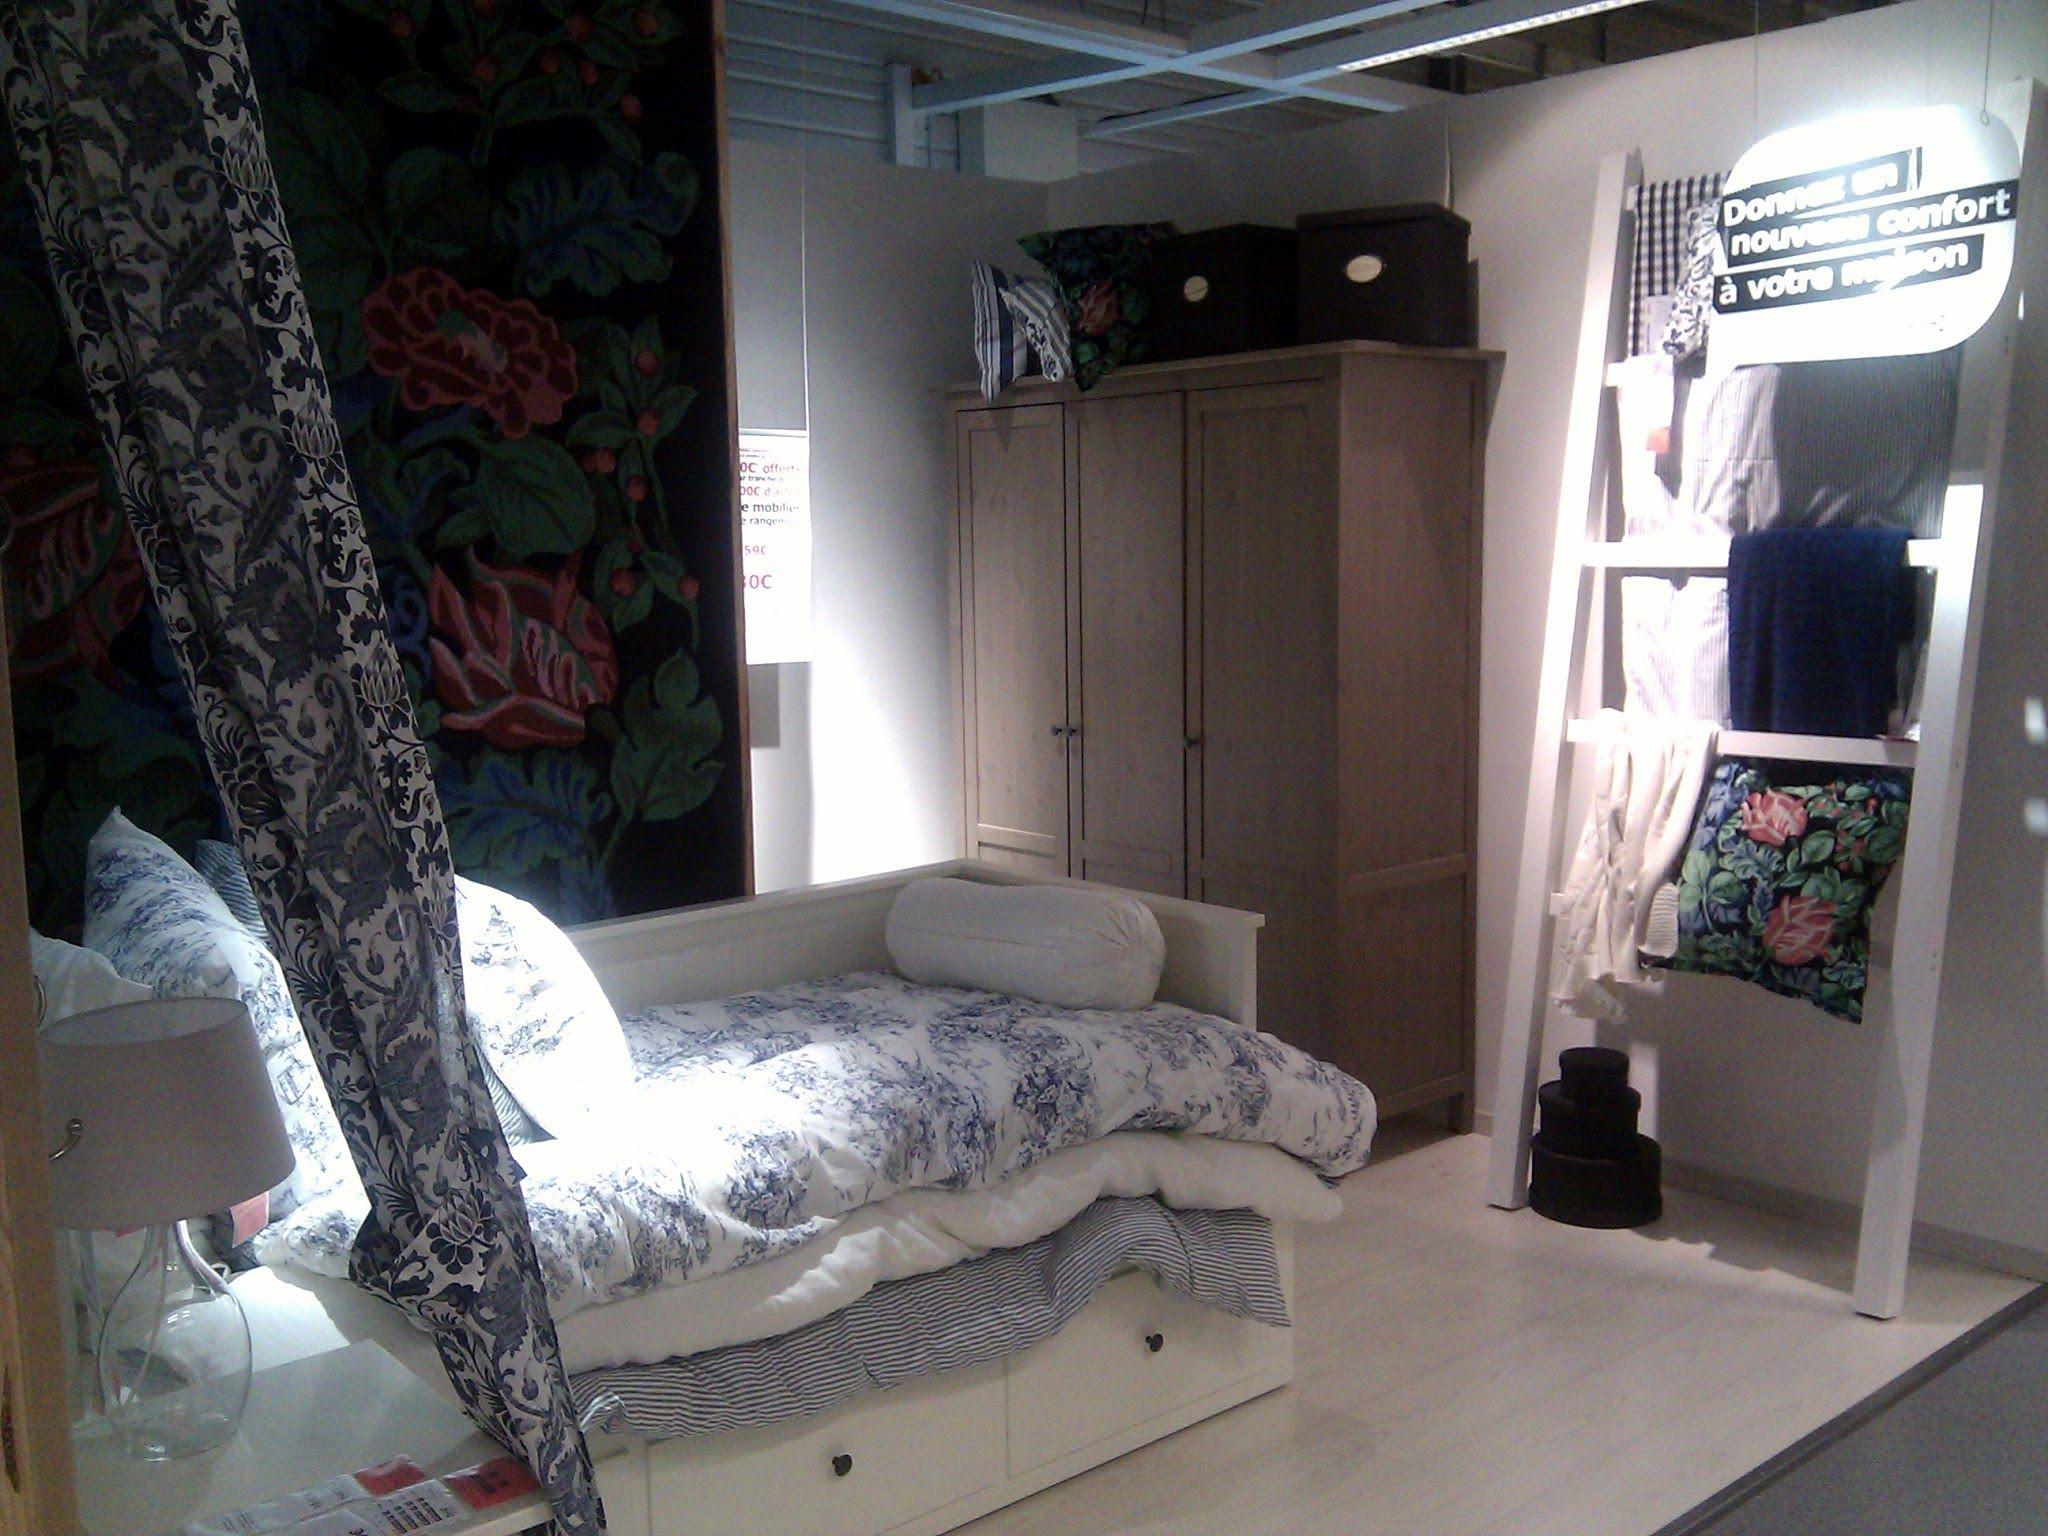 ikea rouen tourville la rivi re france ikea stores tourville la rivi re france pinterest. Black Bedroom Furniture Sets. Home Design Ideas